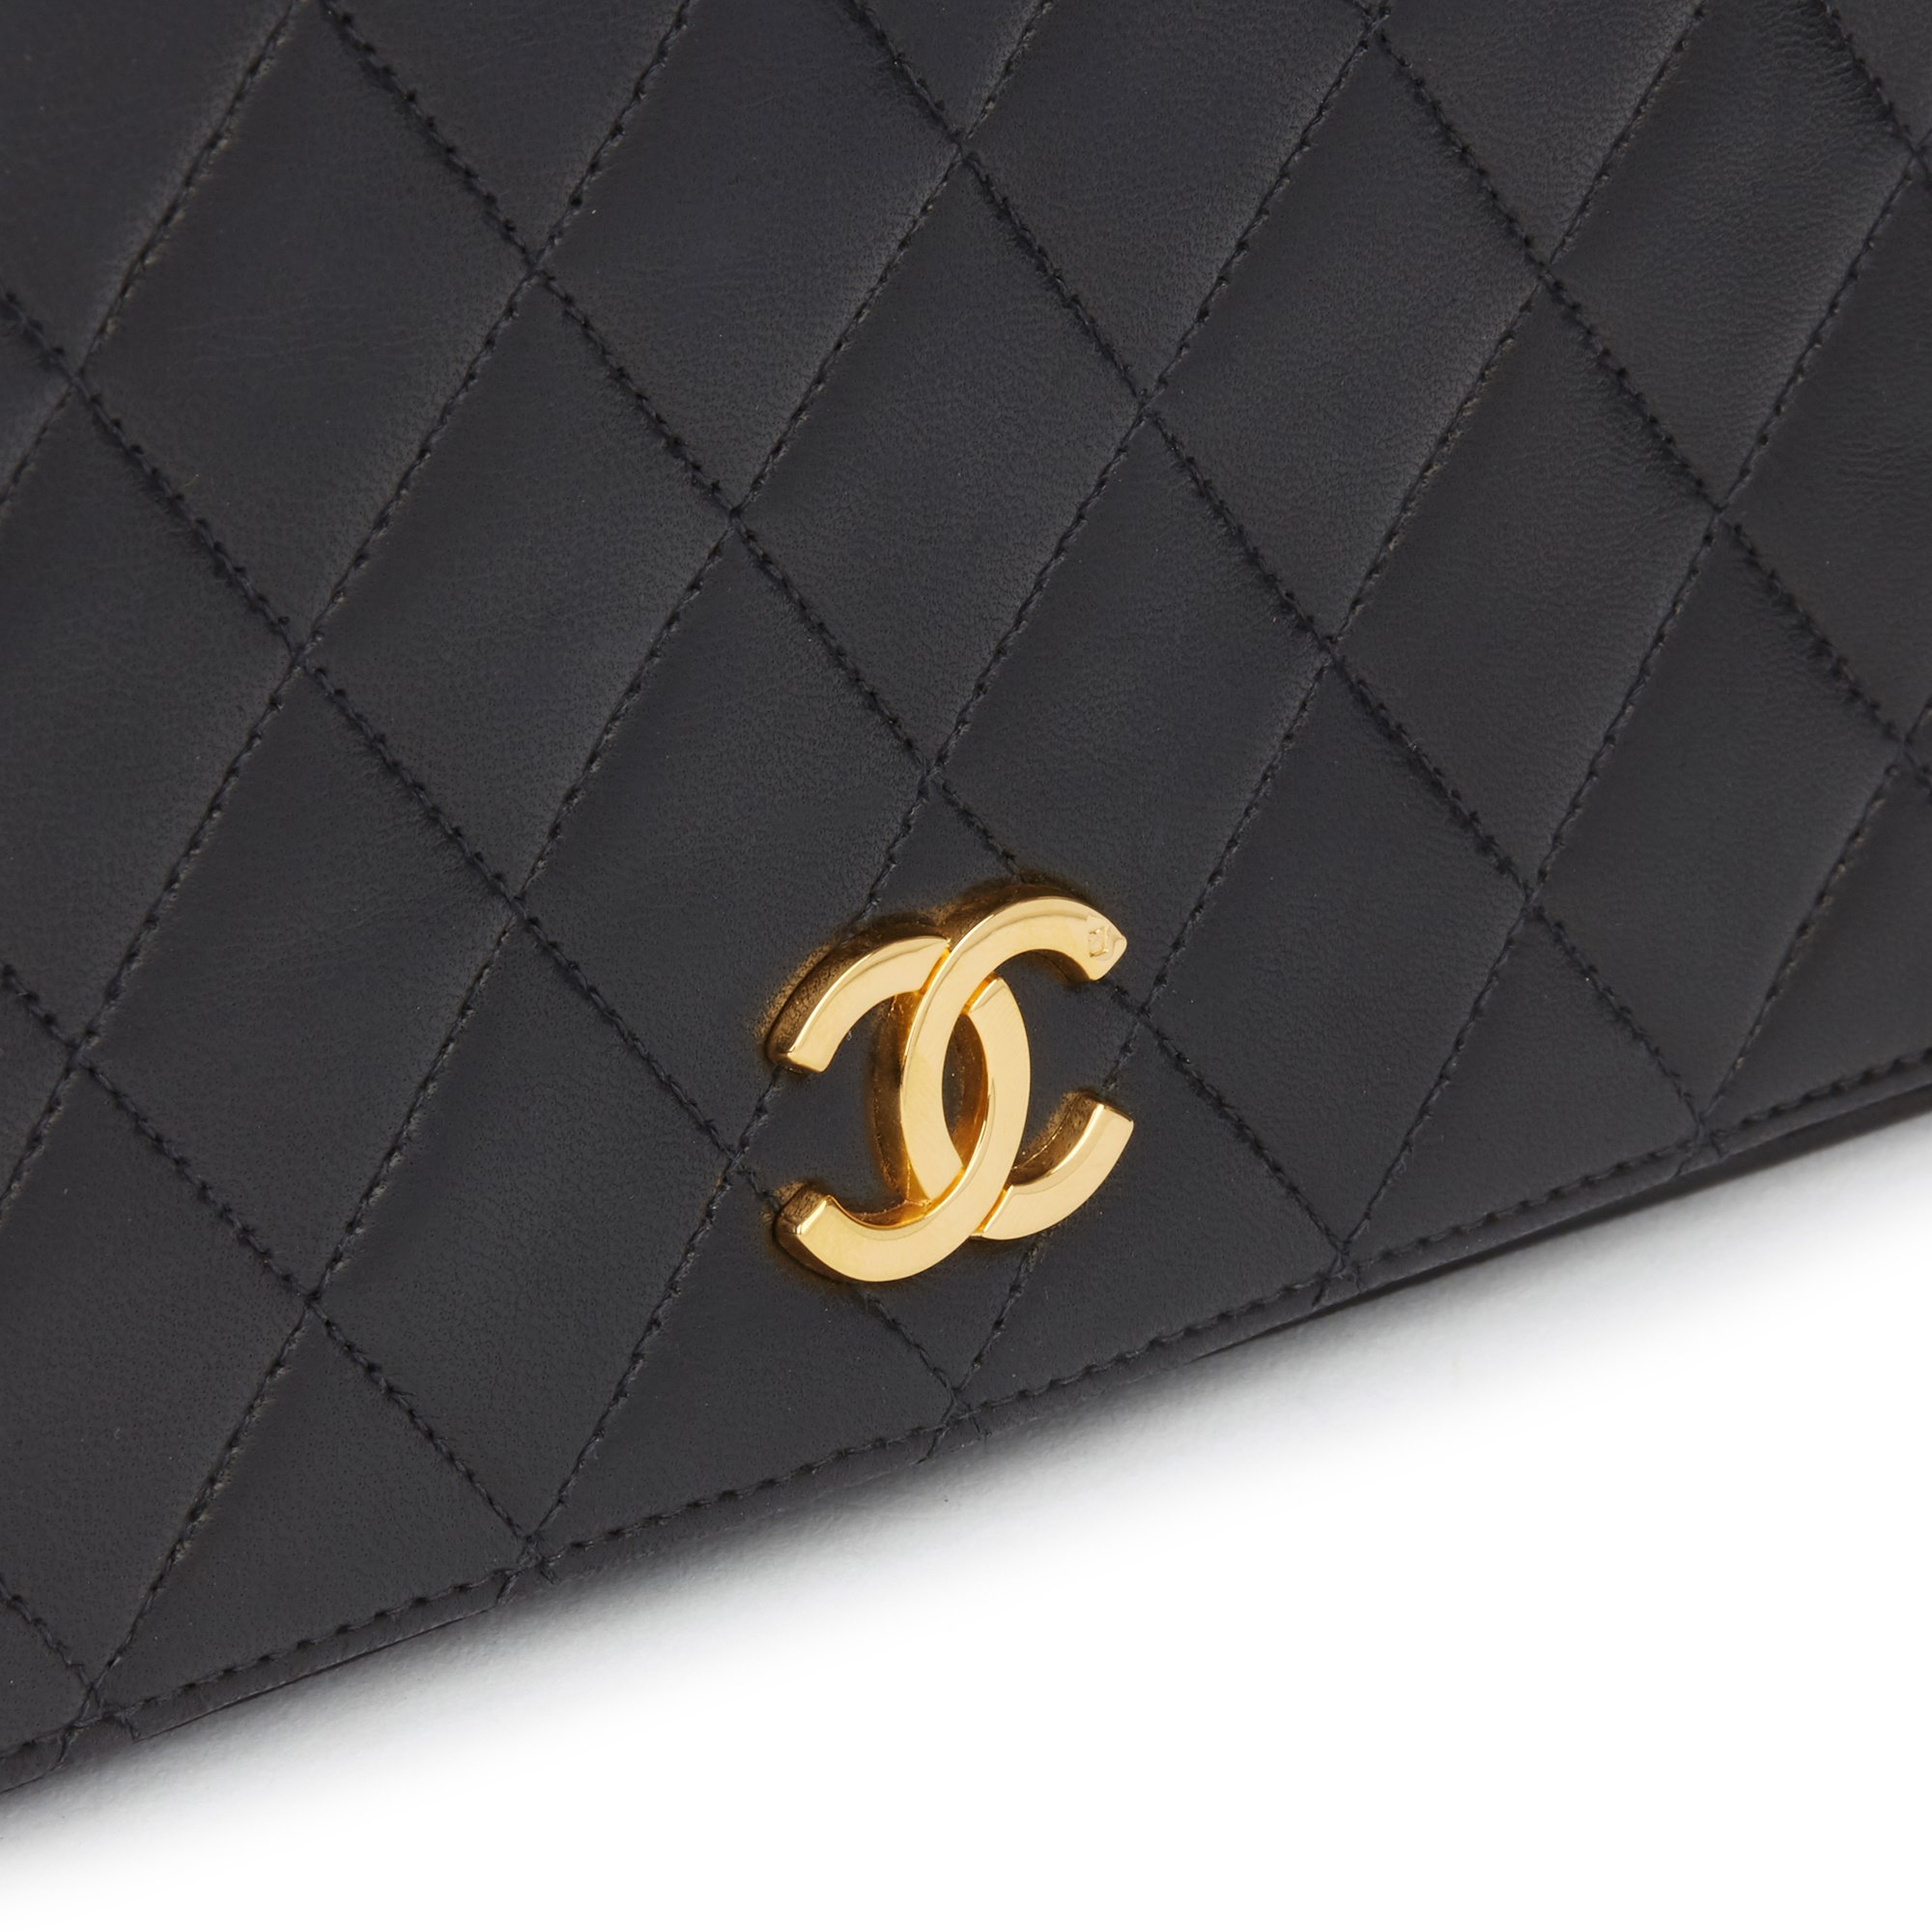 Chanel Black Lambskin Vintage Small Classic Single Full Flap Bag